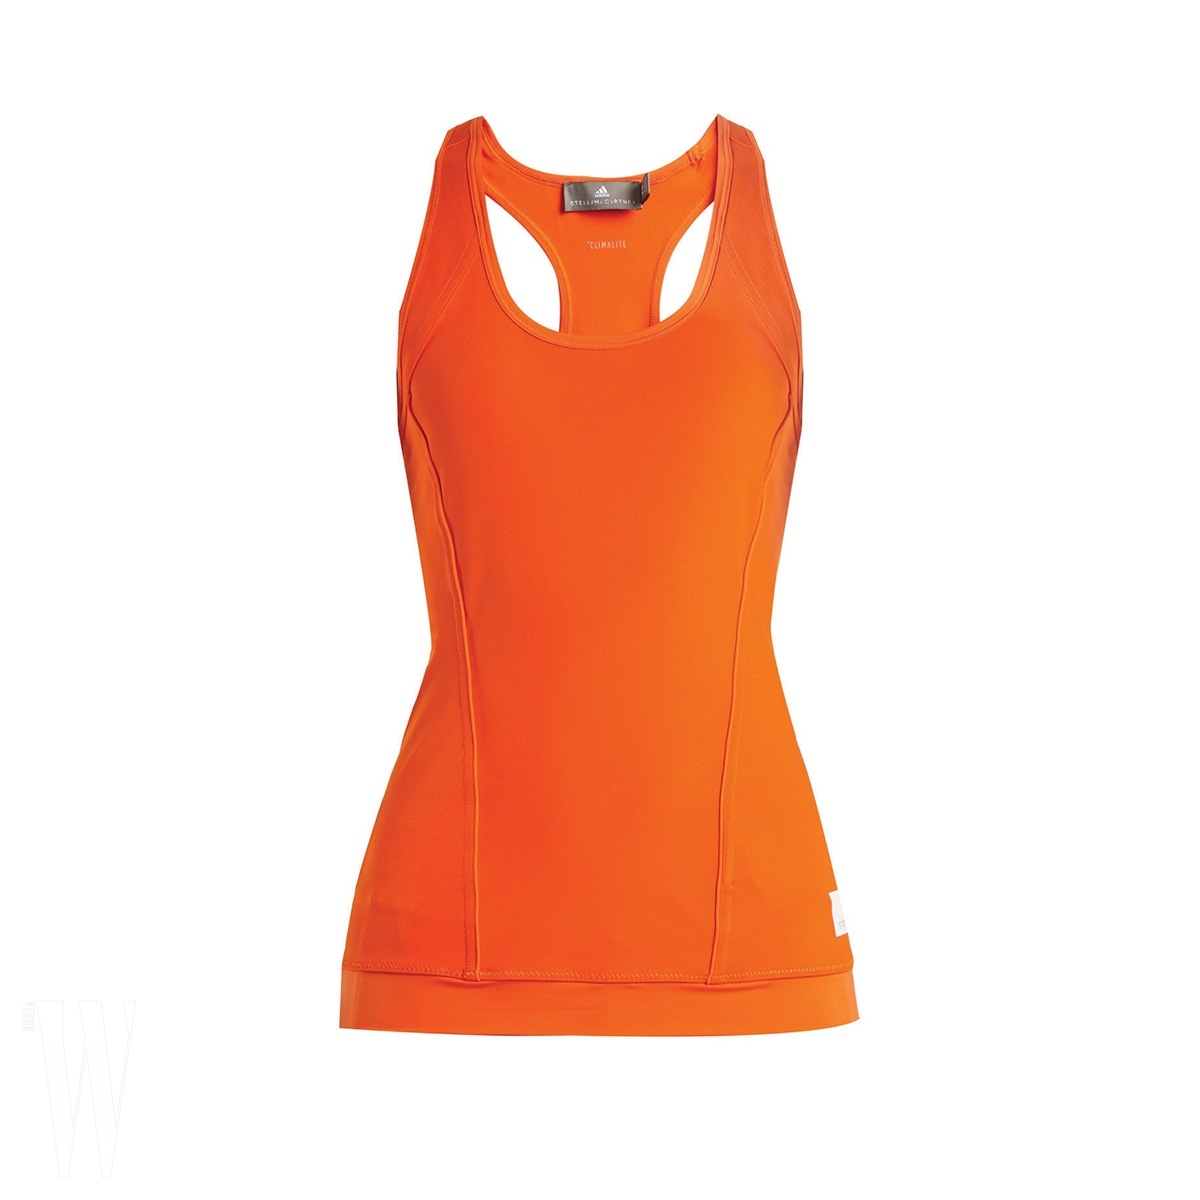 ADIDAS by STELLA McCARTNEY 스포티한 주황색 슬리브리스는 아디다스 by 스텔라 매카트니 제품. 가격 미정.